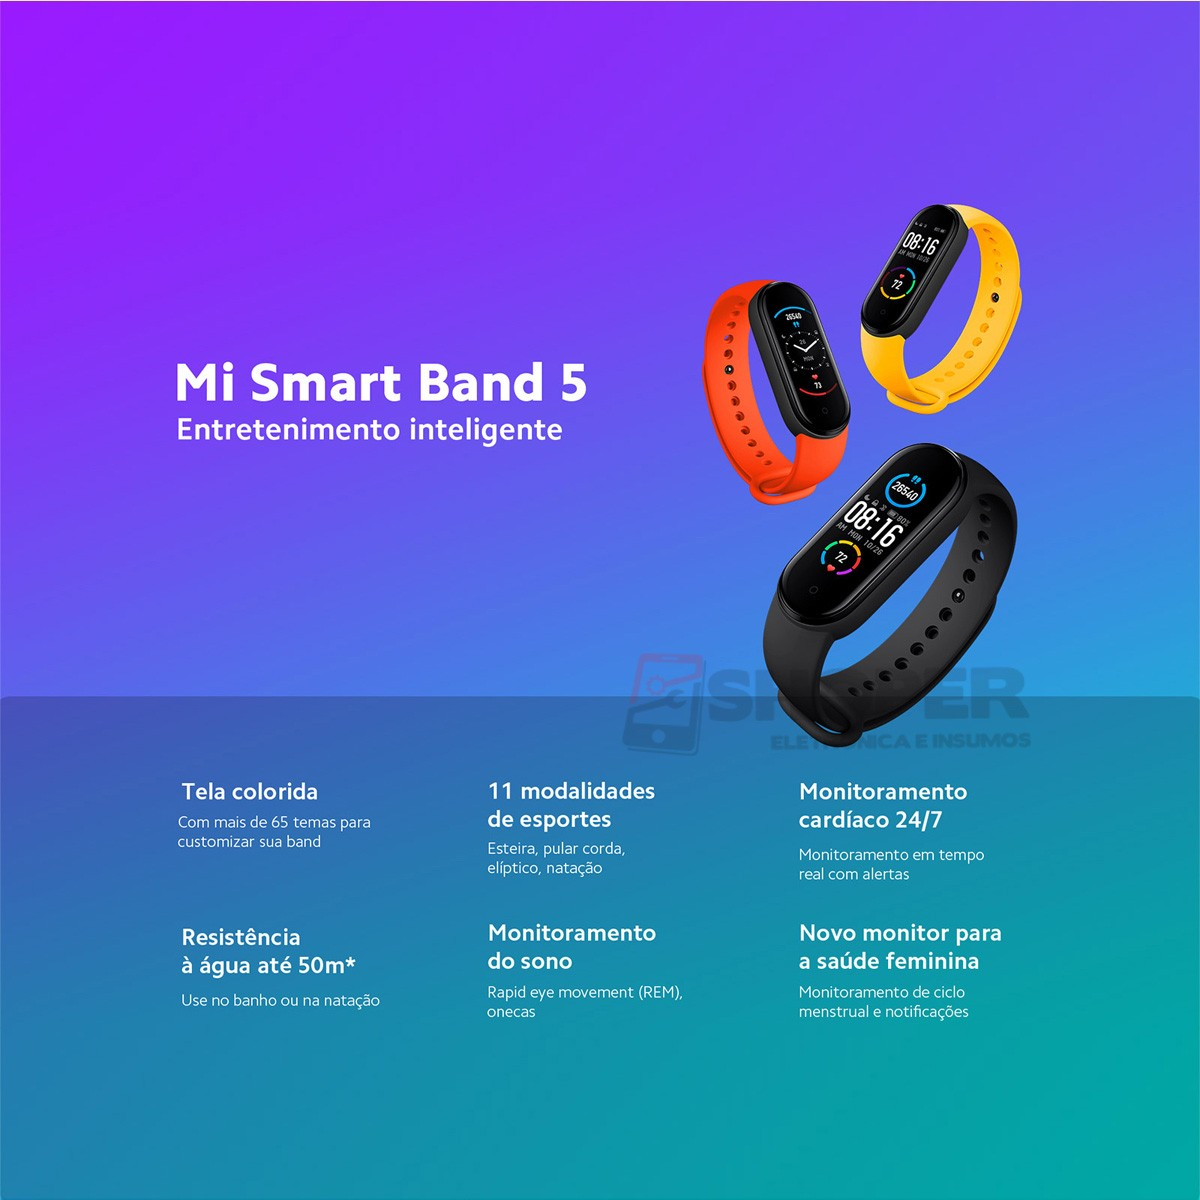 Pulseira Inteligente Mi Smart Band 5 (Mi Band 5)